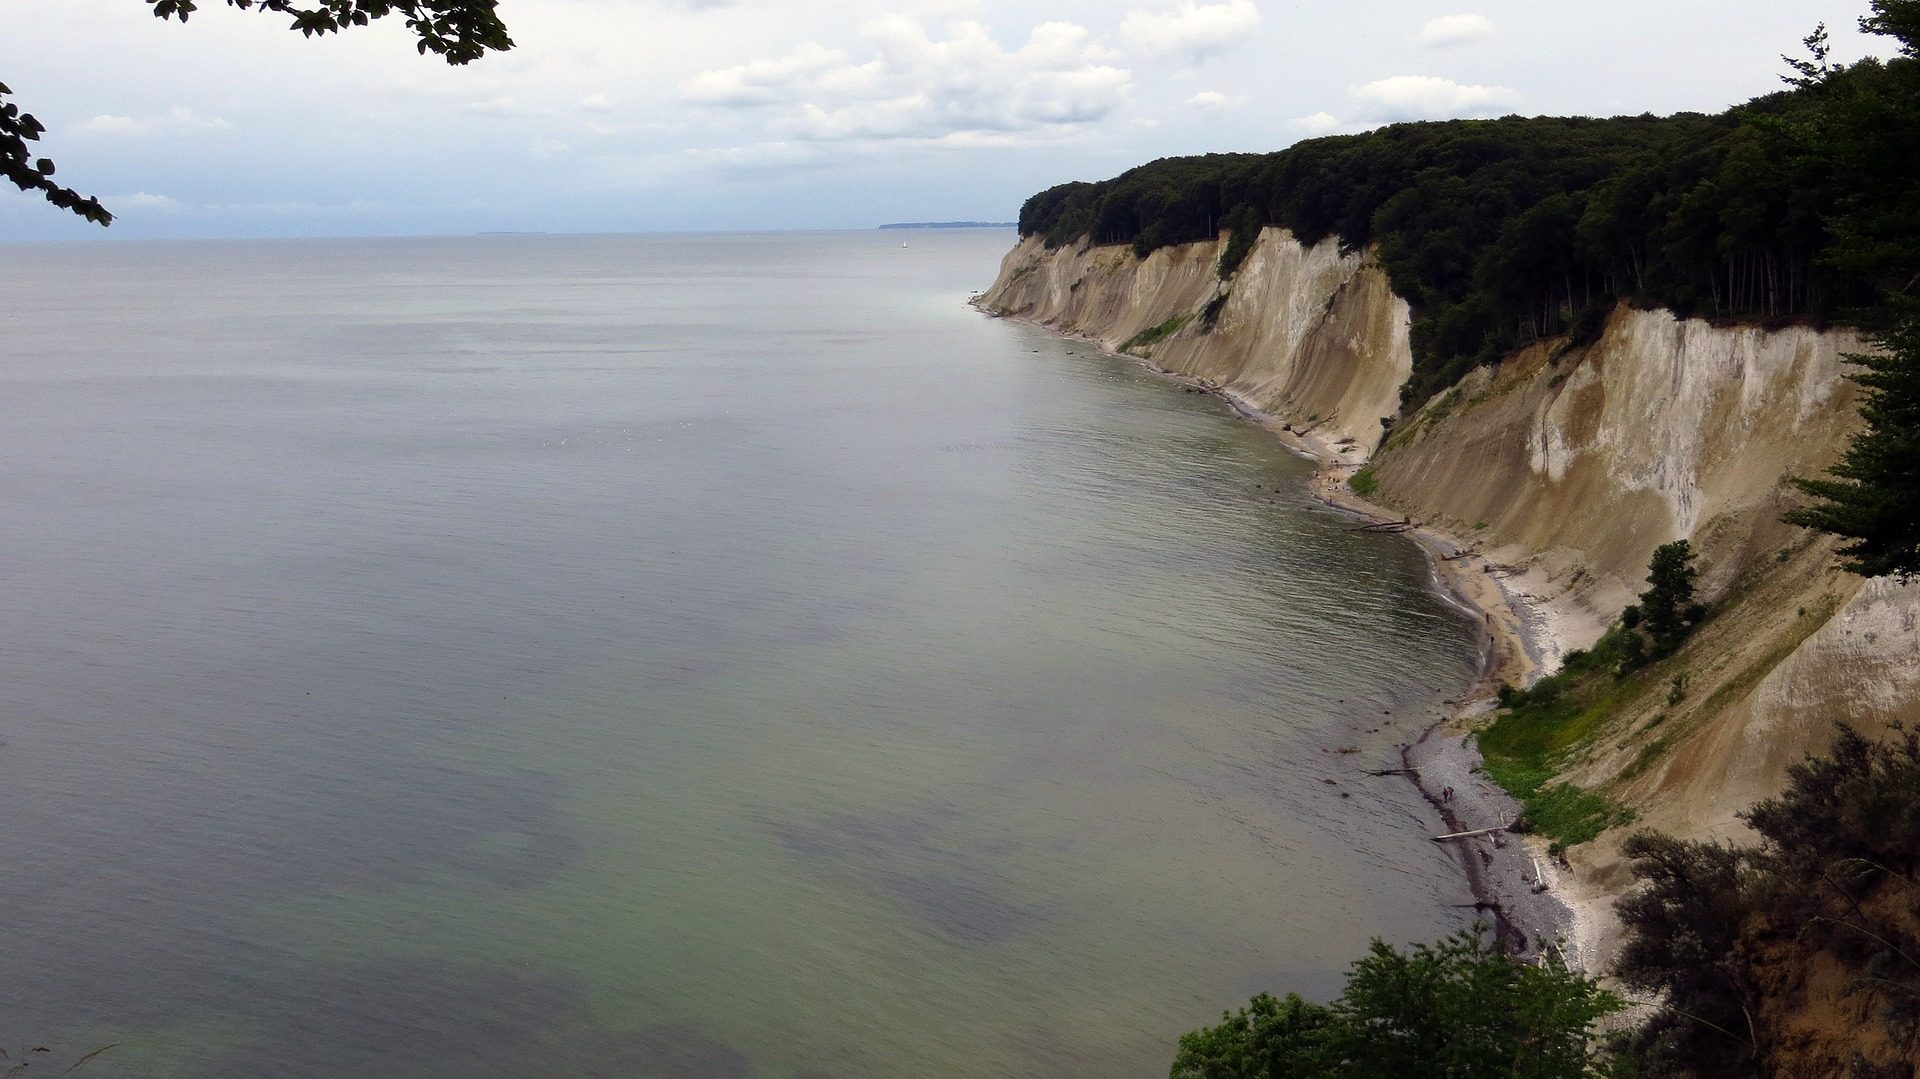 क्लिफ, सागर, ऊंचाई, rugen, जर्मनी - HD वॉलपेपर - प्रोफेसर-falken.com